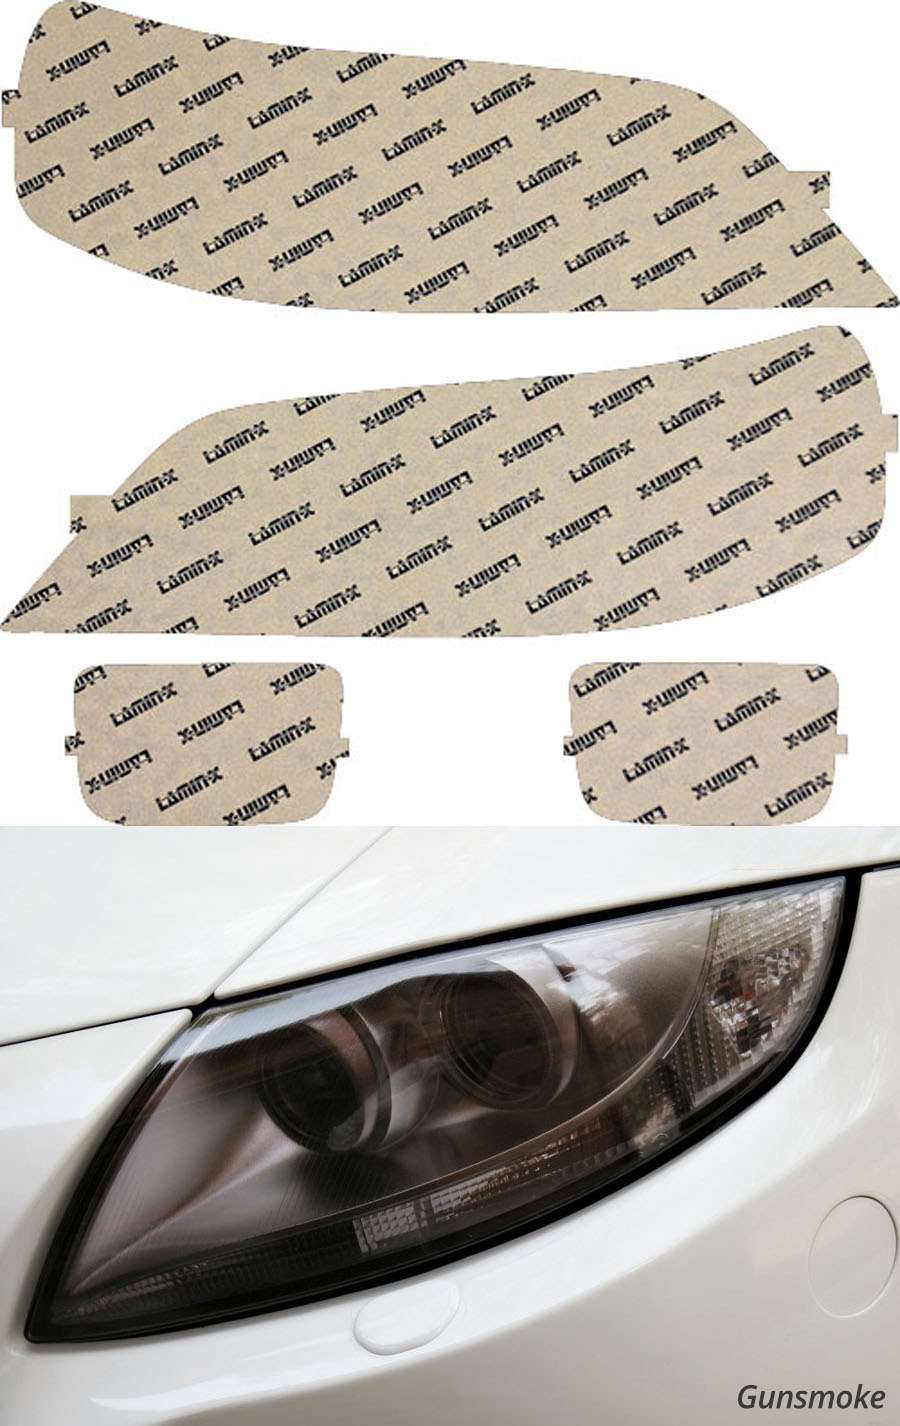 Acura RL 02-04 Gunsmoke Headlight Covers Lamin-X AC404G